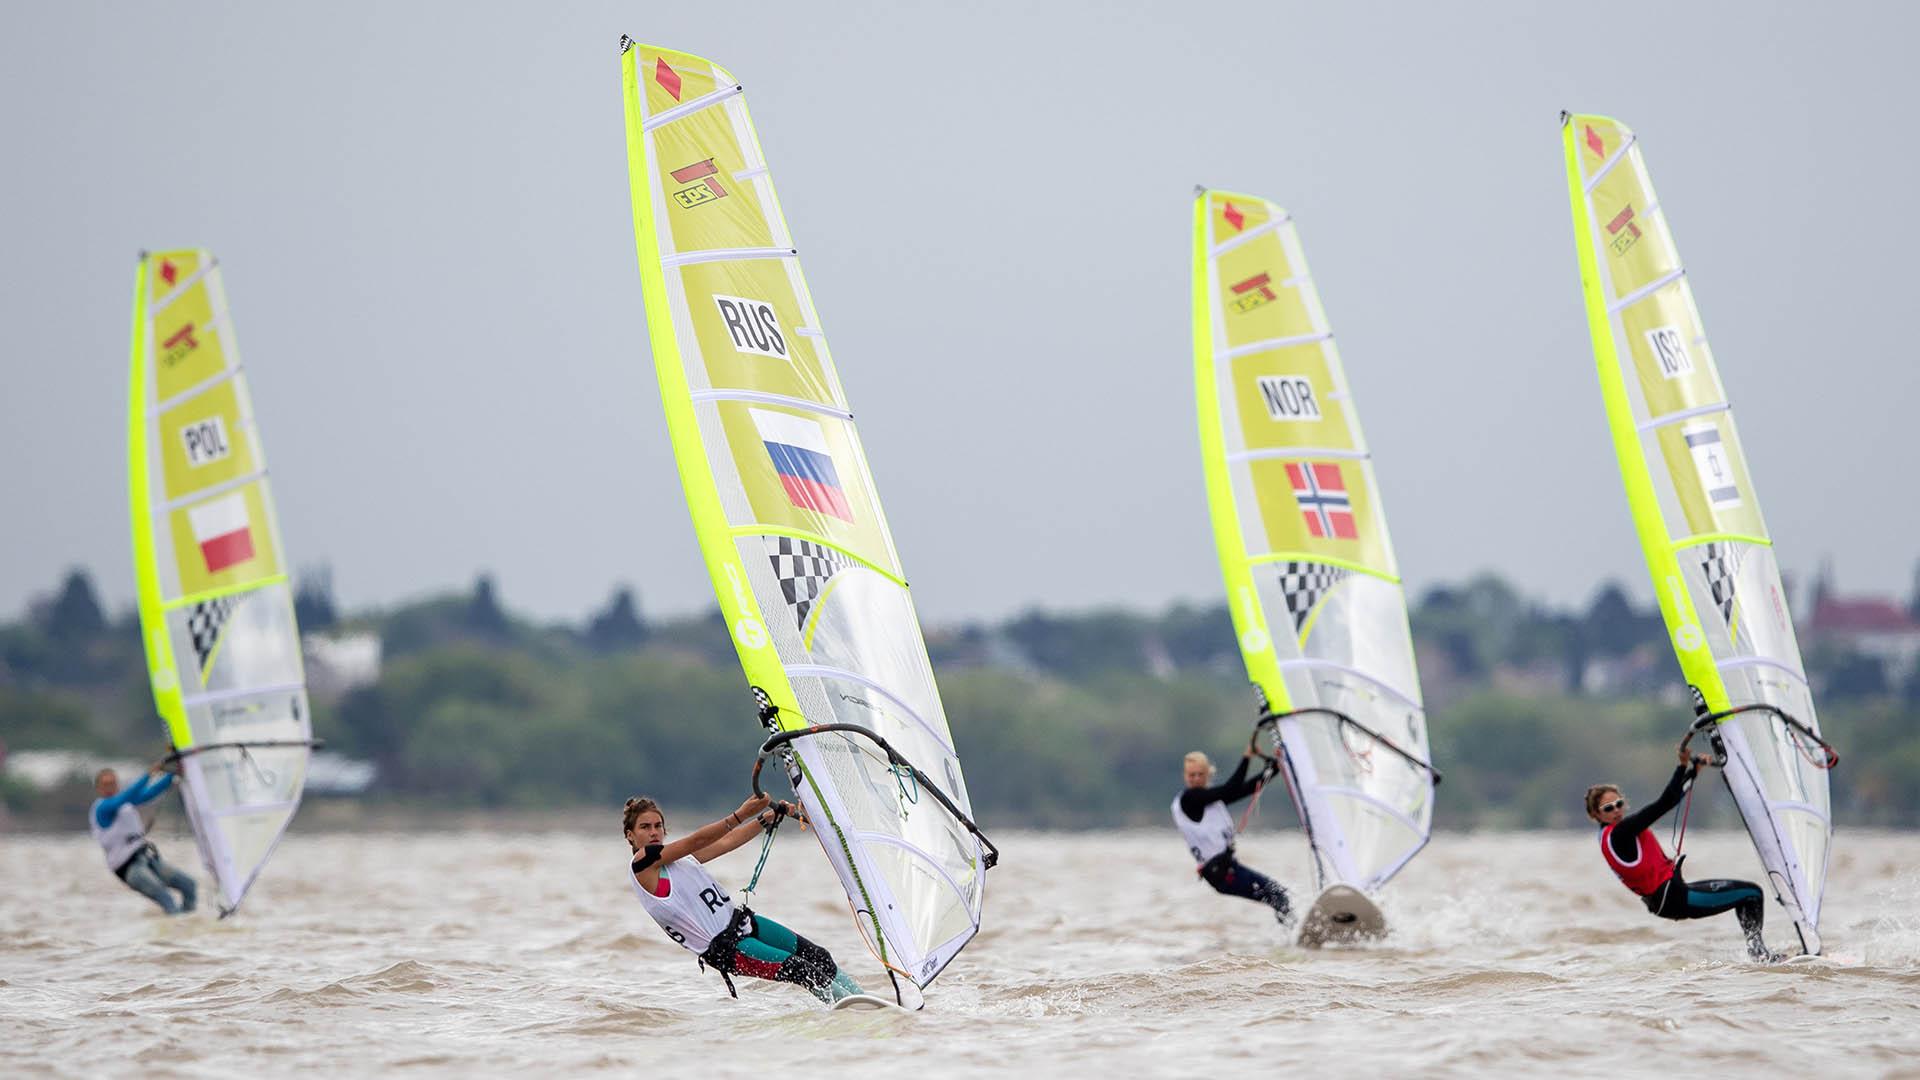 La rusa Yana Reznikovalidera la final del Windsurferen el Club Náutico San Isidro (Foto: REUTERS)